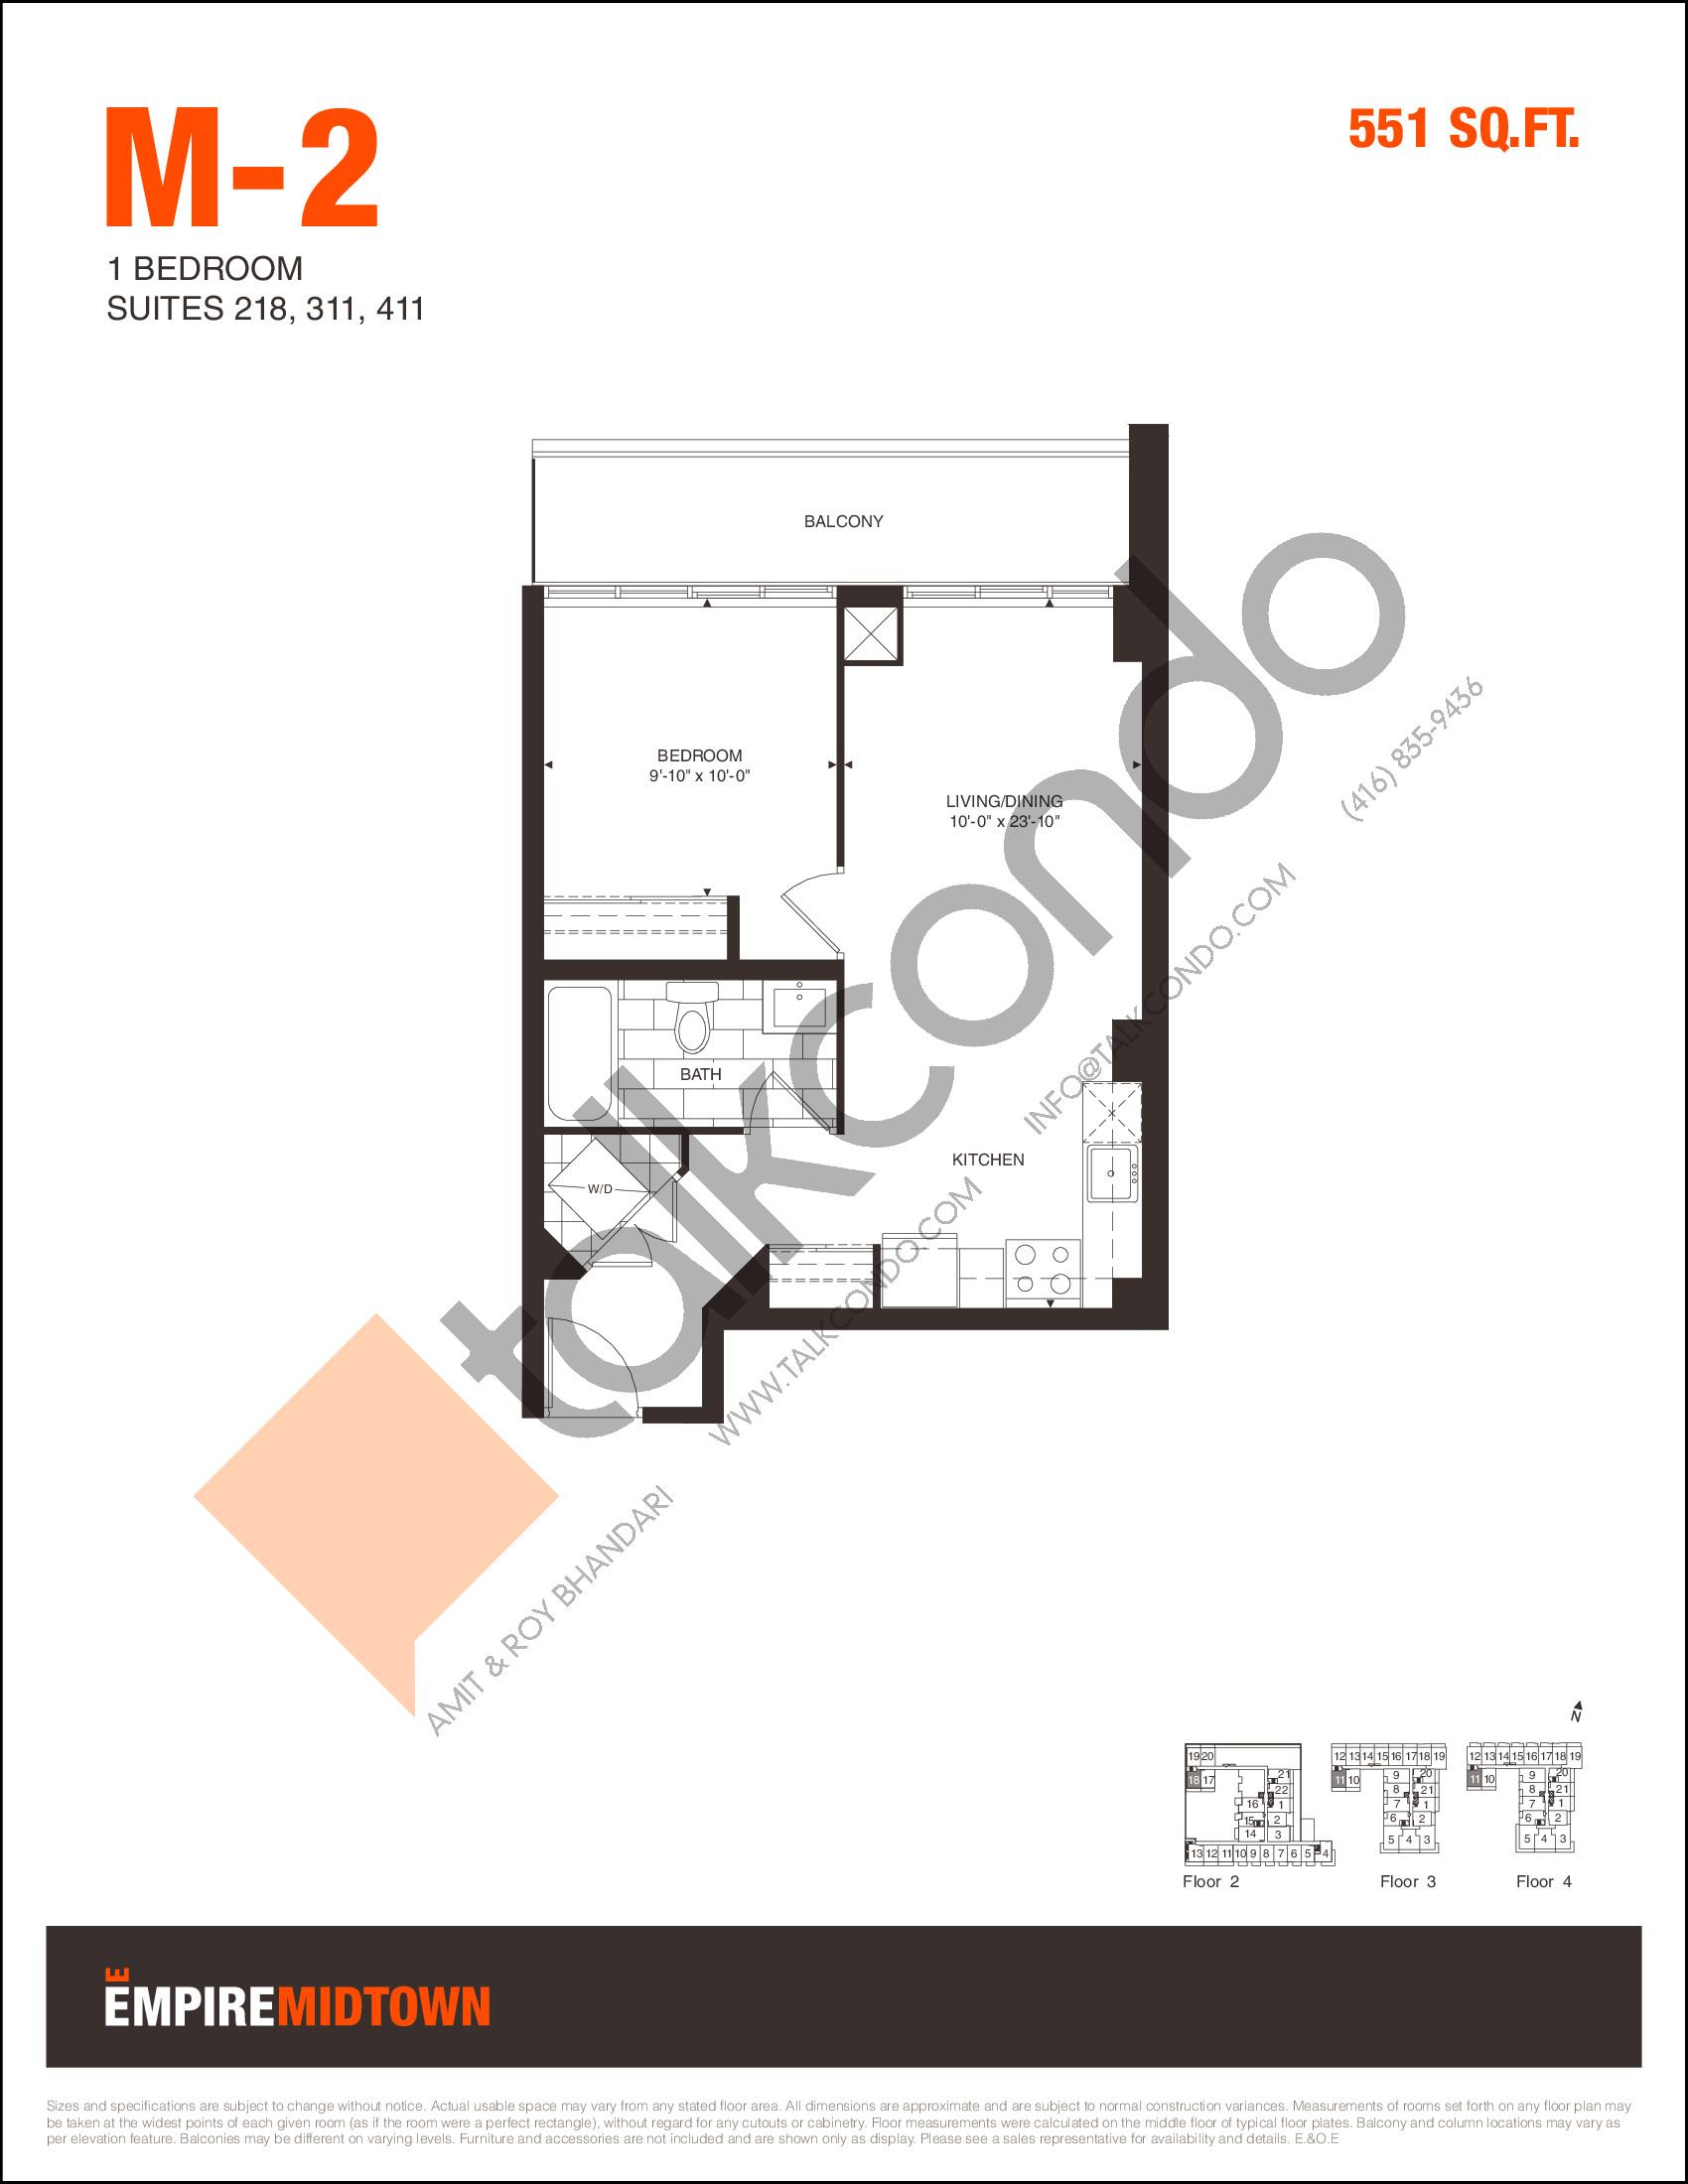 M-2 Floor Plan at Empire Midtown Condos - 551 sq.ft